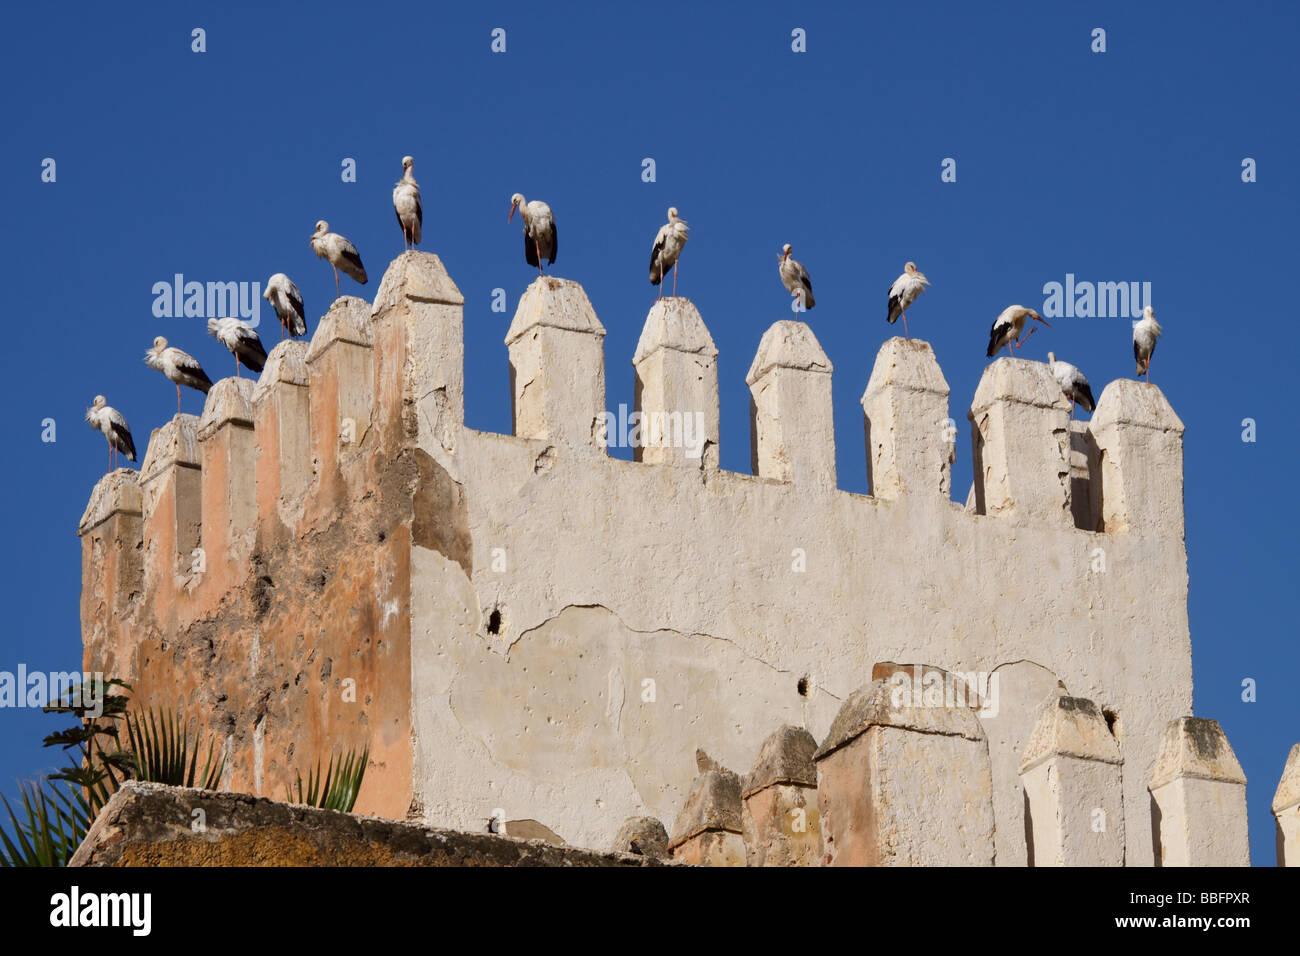 África, África del Norte, Marruecos, Fez, Fez el-Jdid, Petit Mechouar, Bab Makina, Fortaleza, Torre, encaramado Imagen De Stock